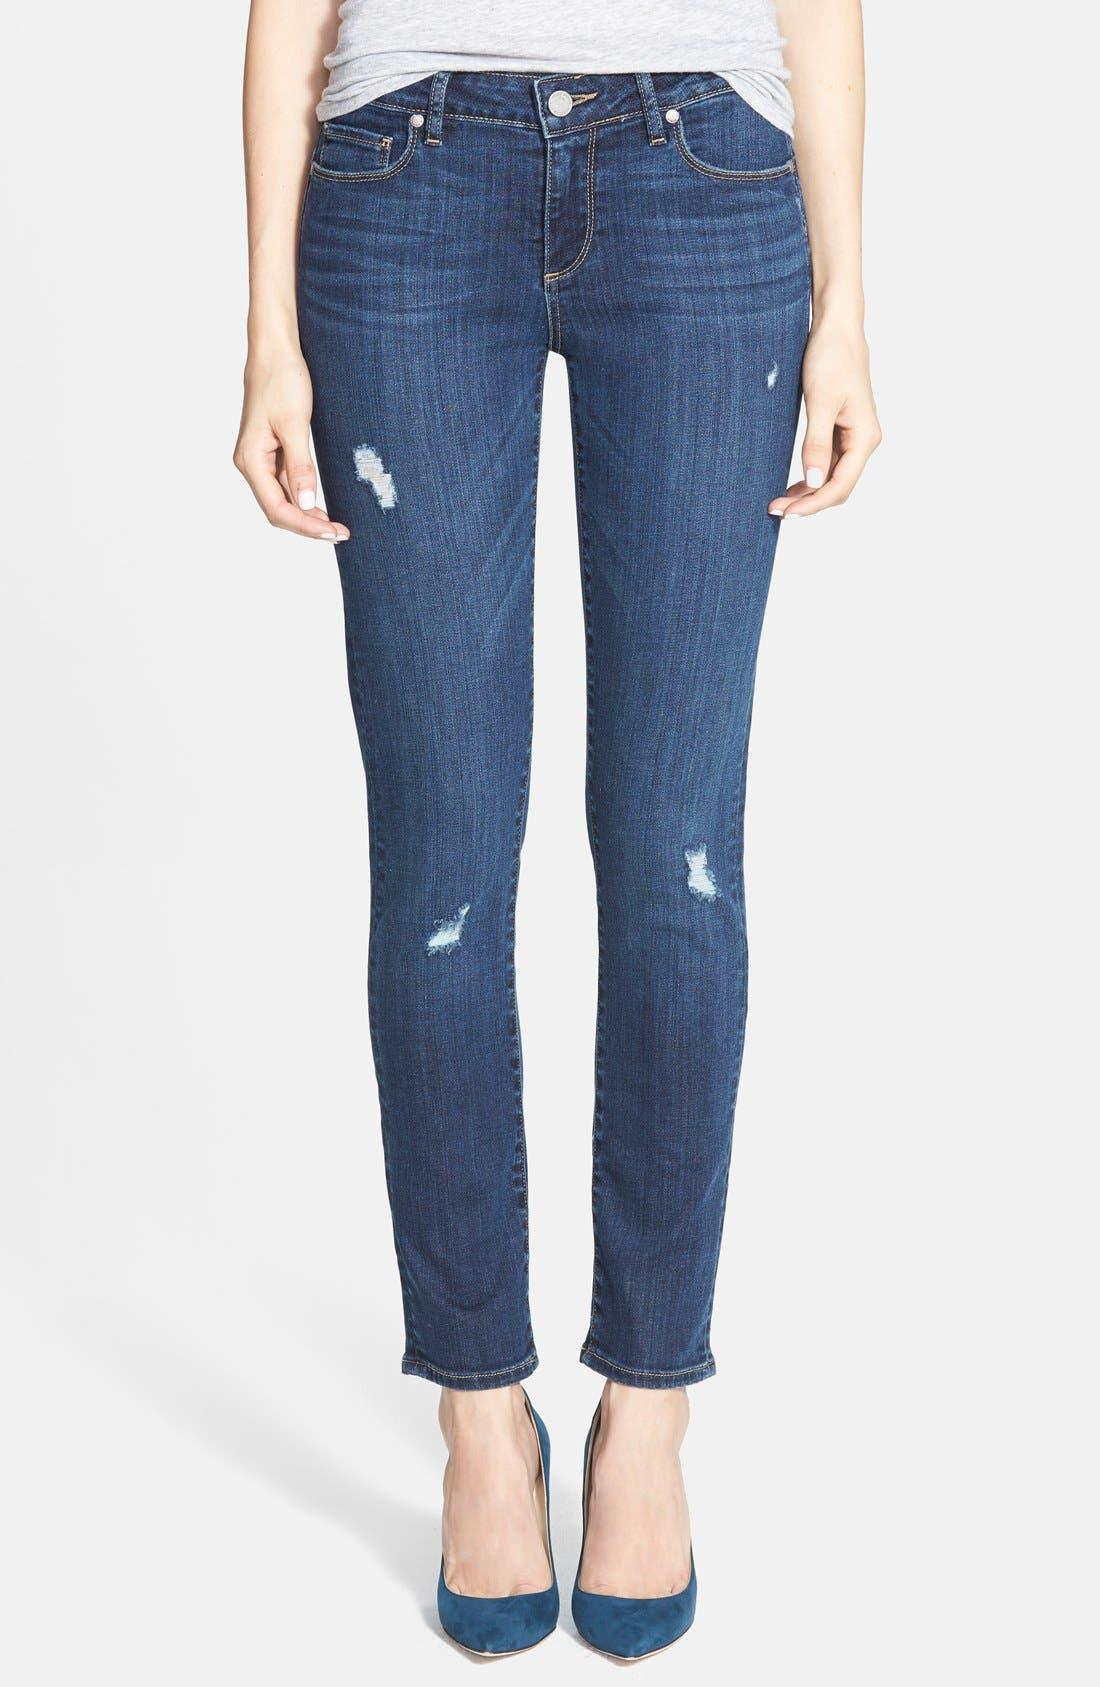 Main Image - Paige Denim 'Skyline' Ankle Peg Skinny Jeans (Lyric Deconstructed)